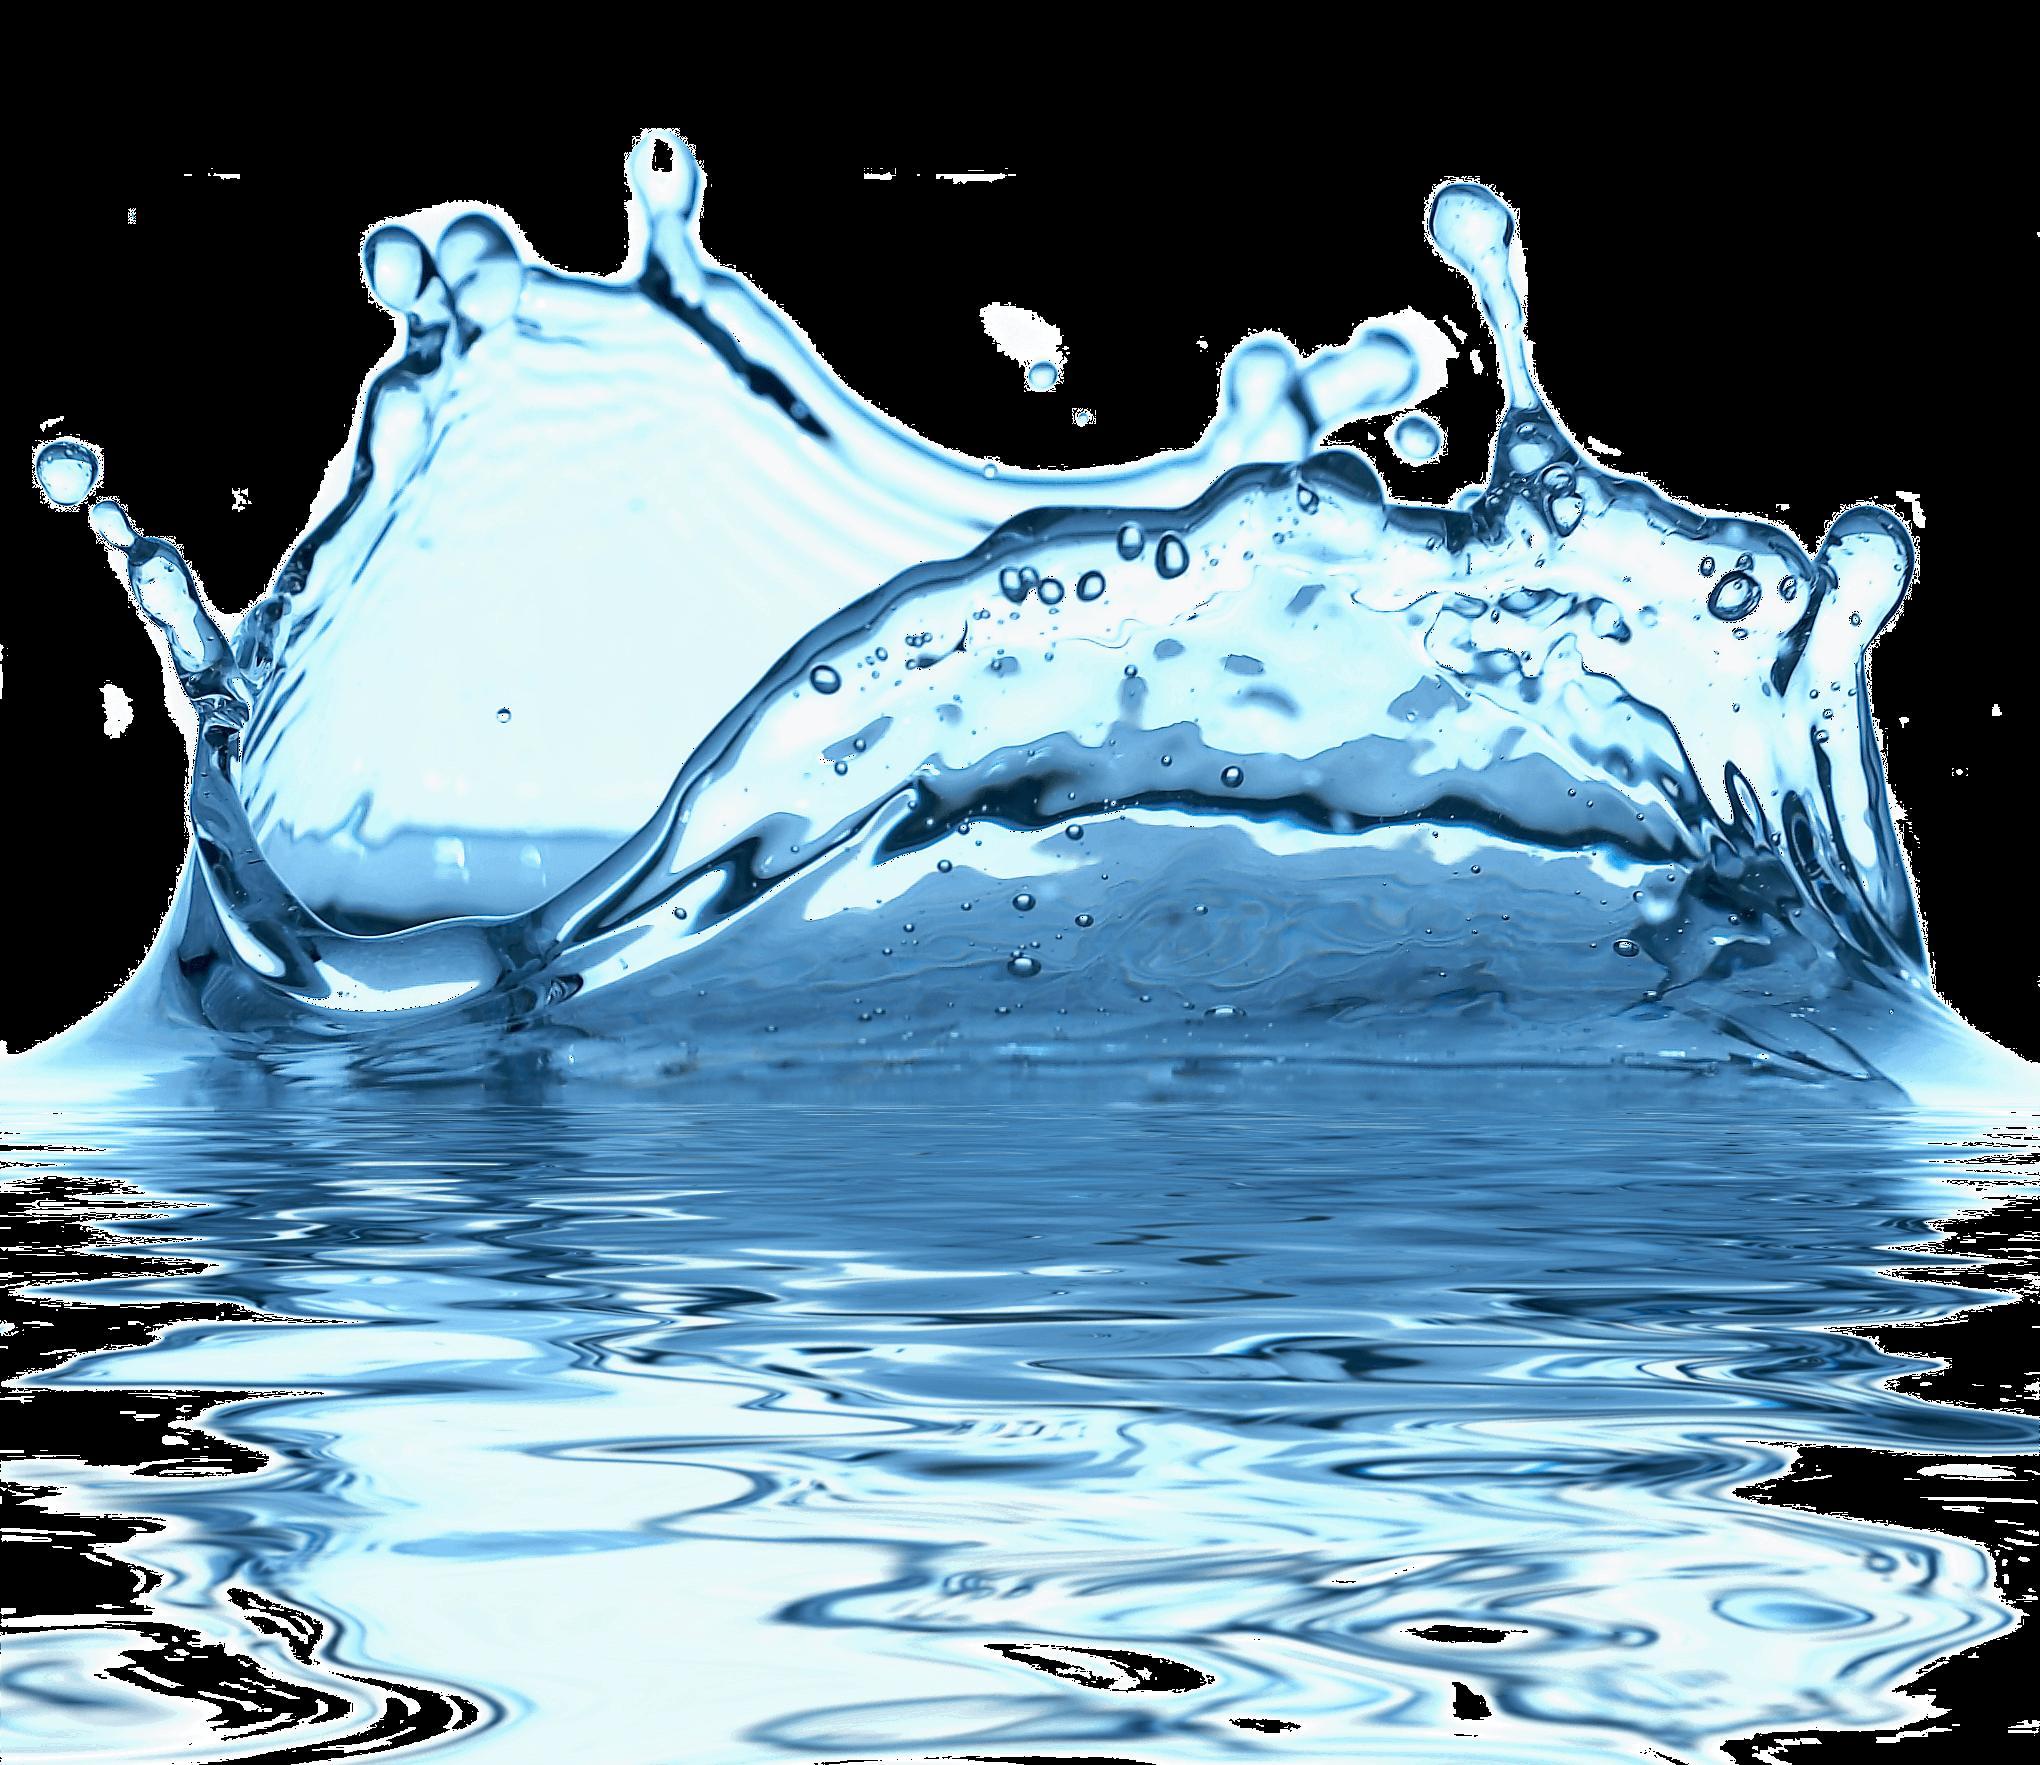 Clipart water transparent background. Splatter png stickpng